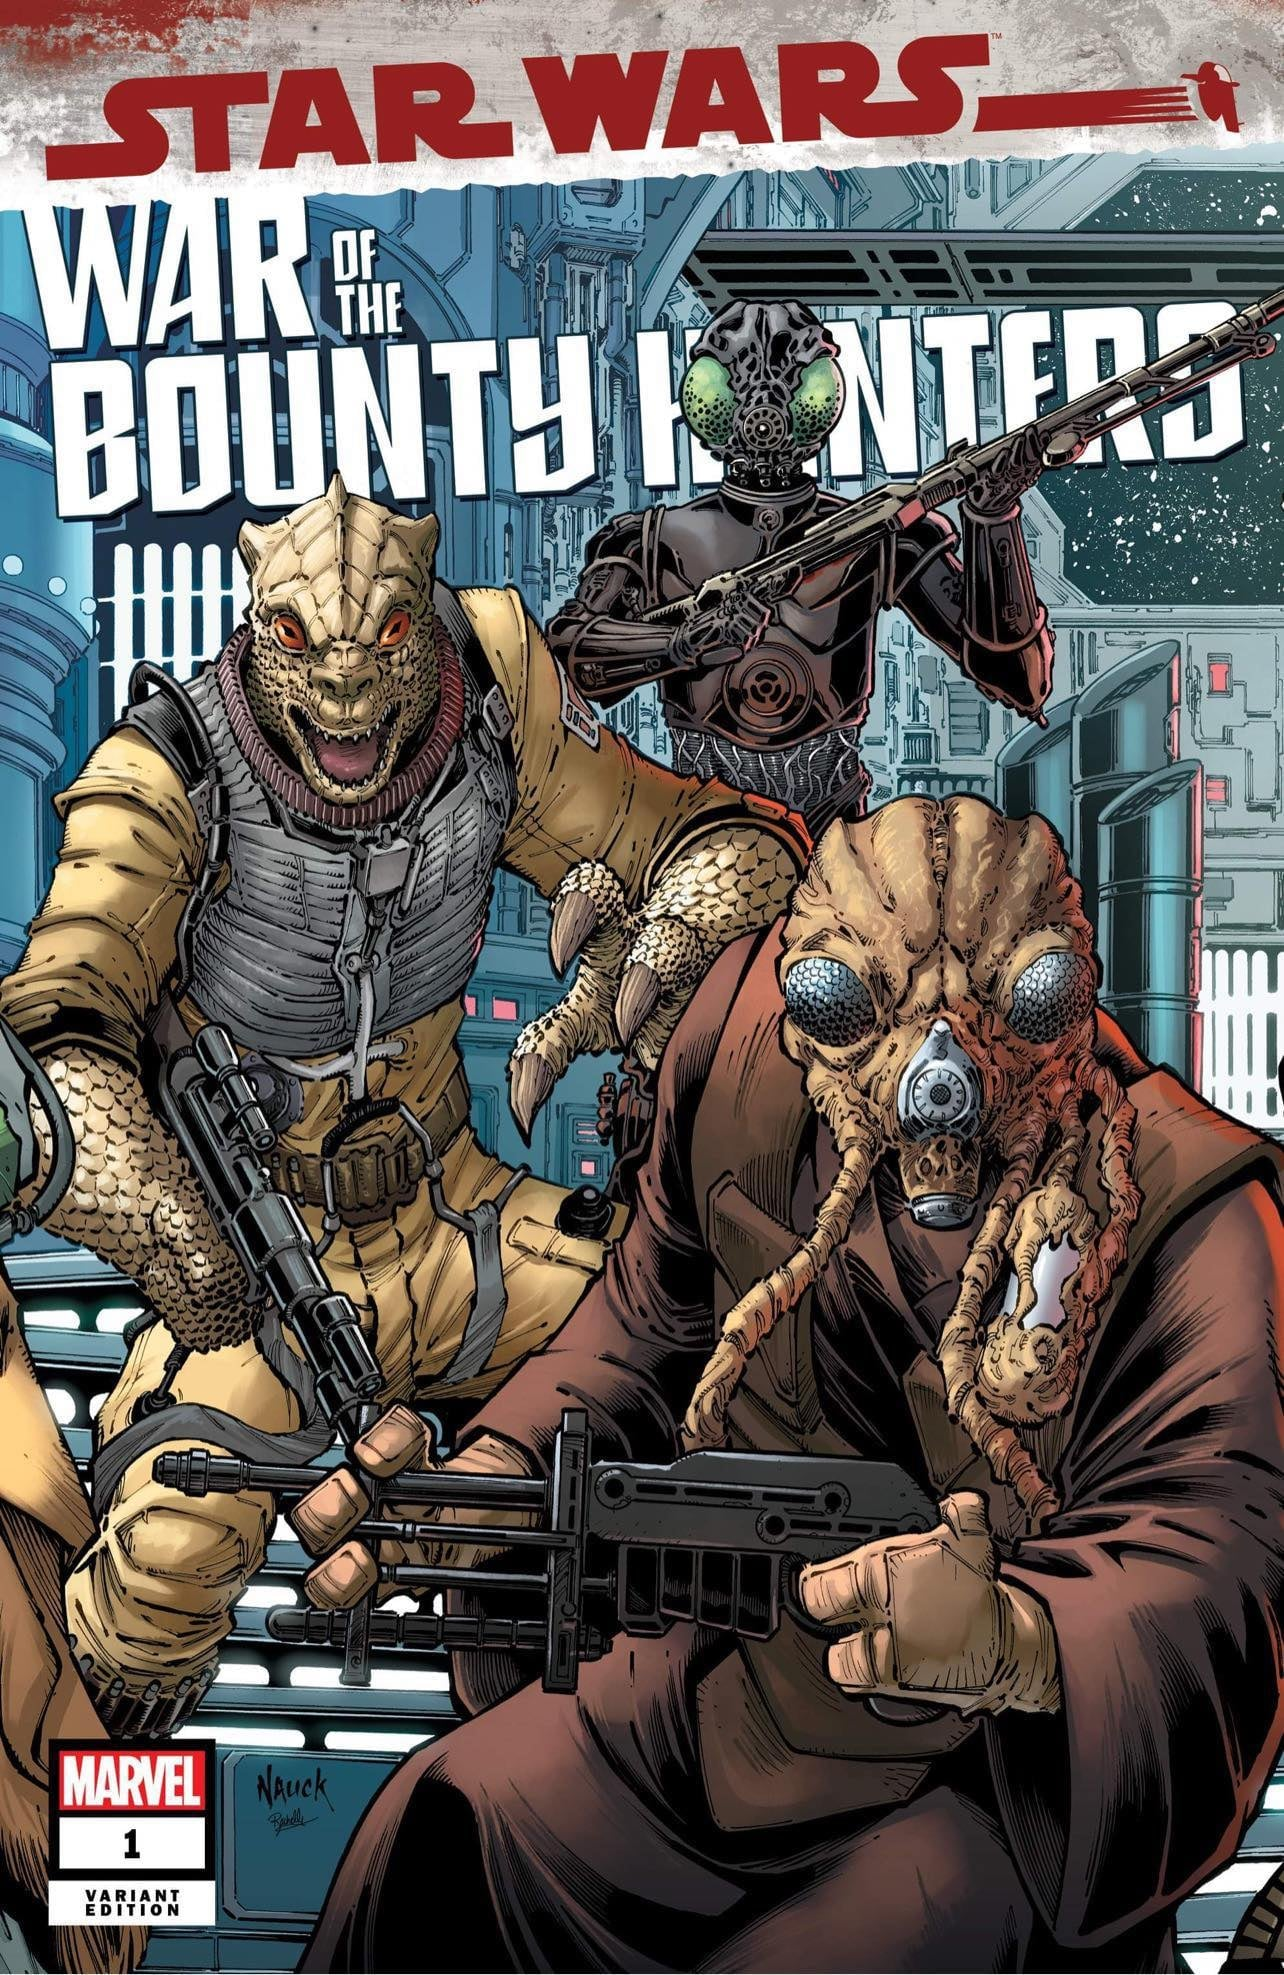 Star Wars: War of the Bounty Hunters 1 - Comics Elite Variant